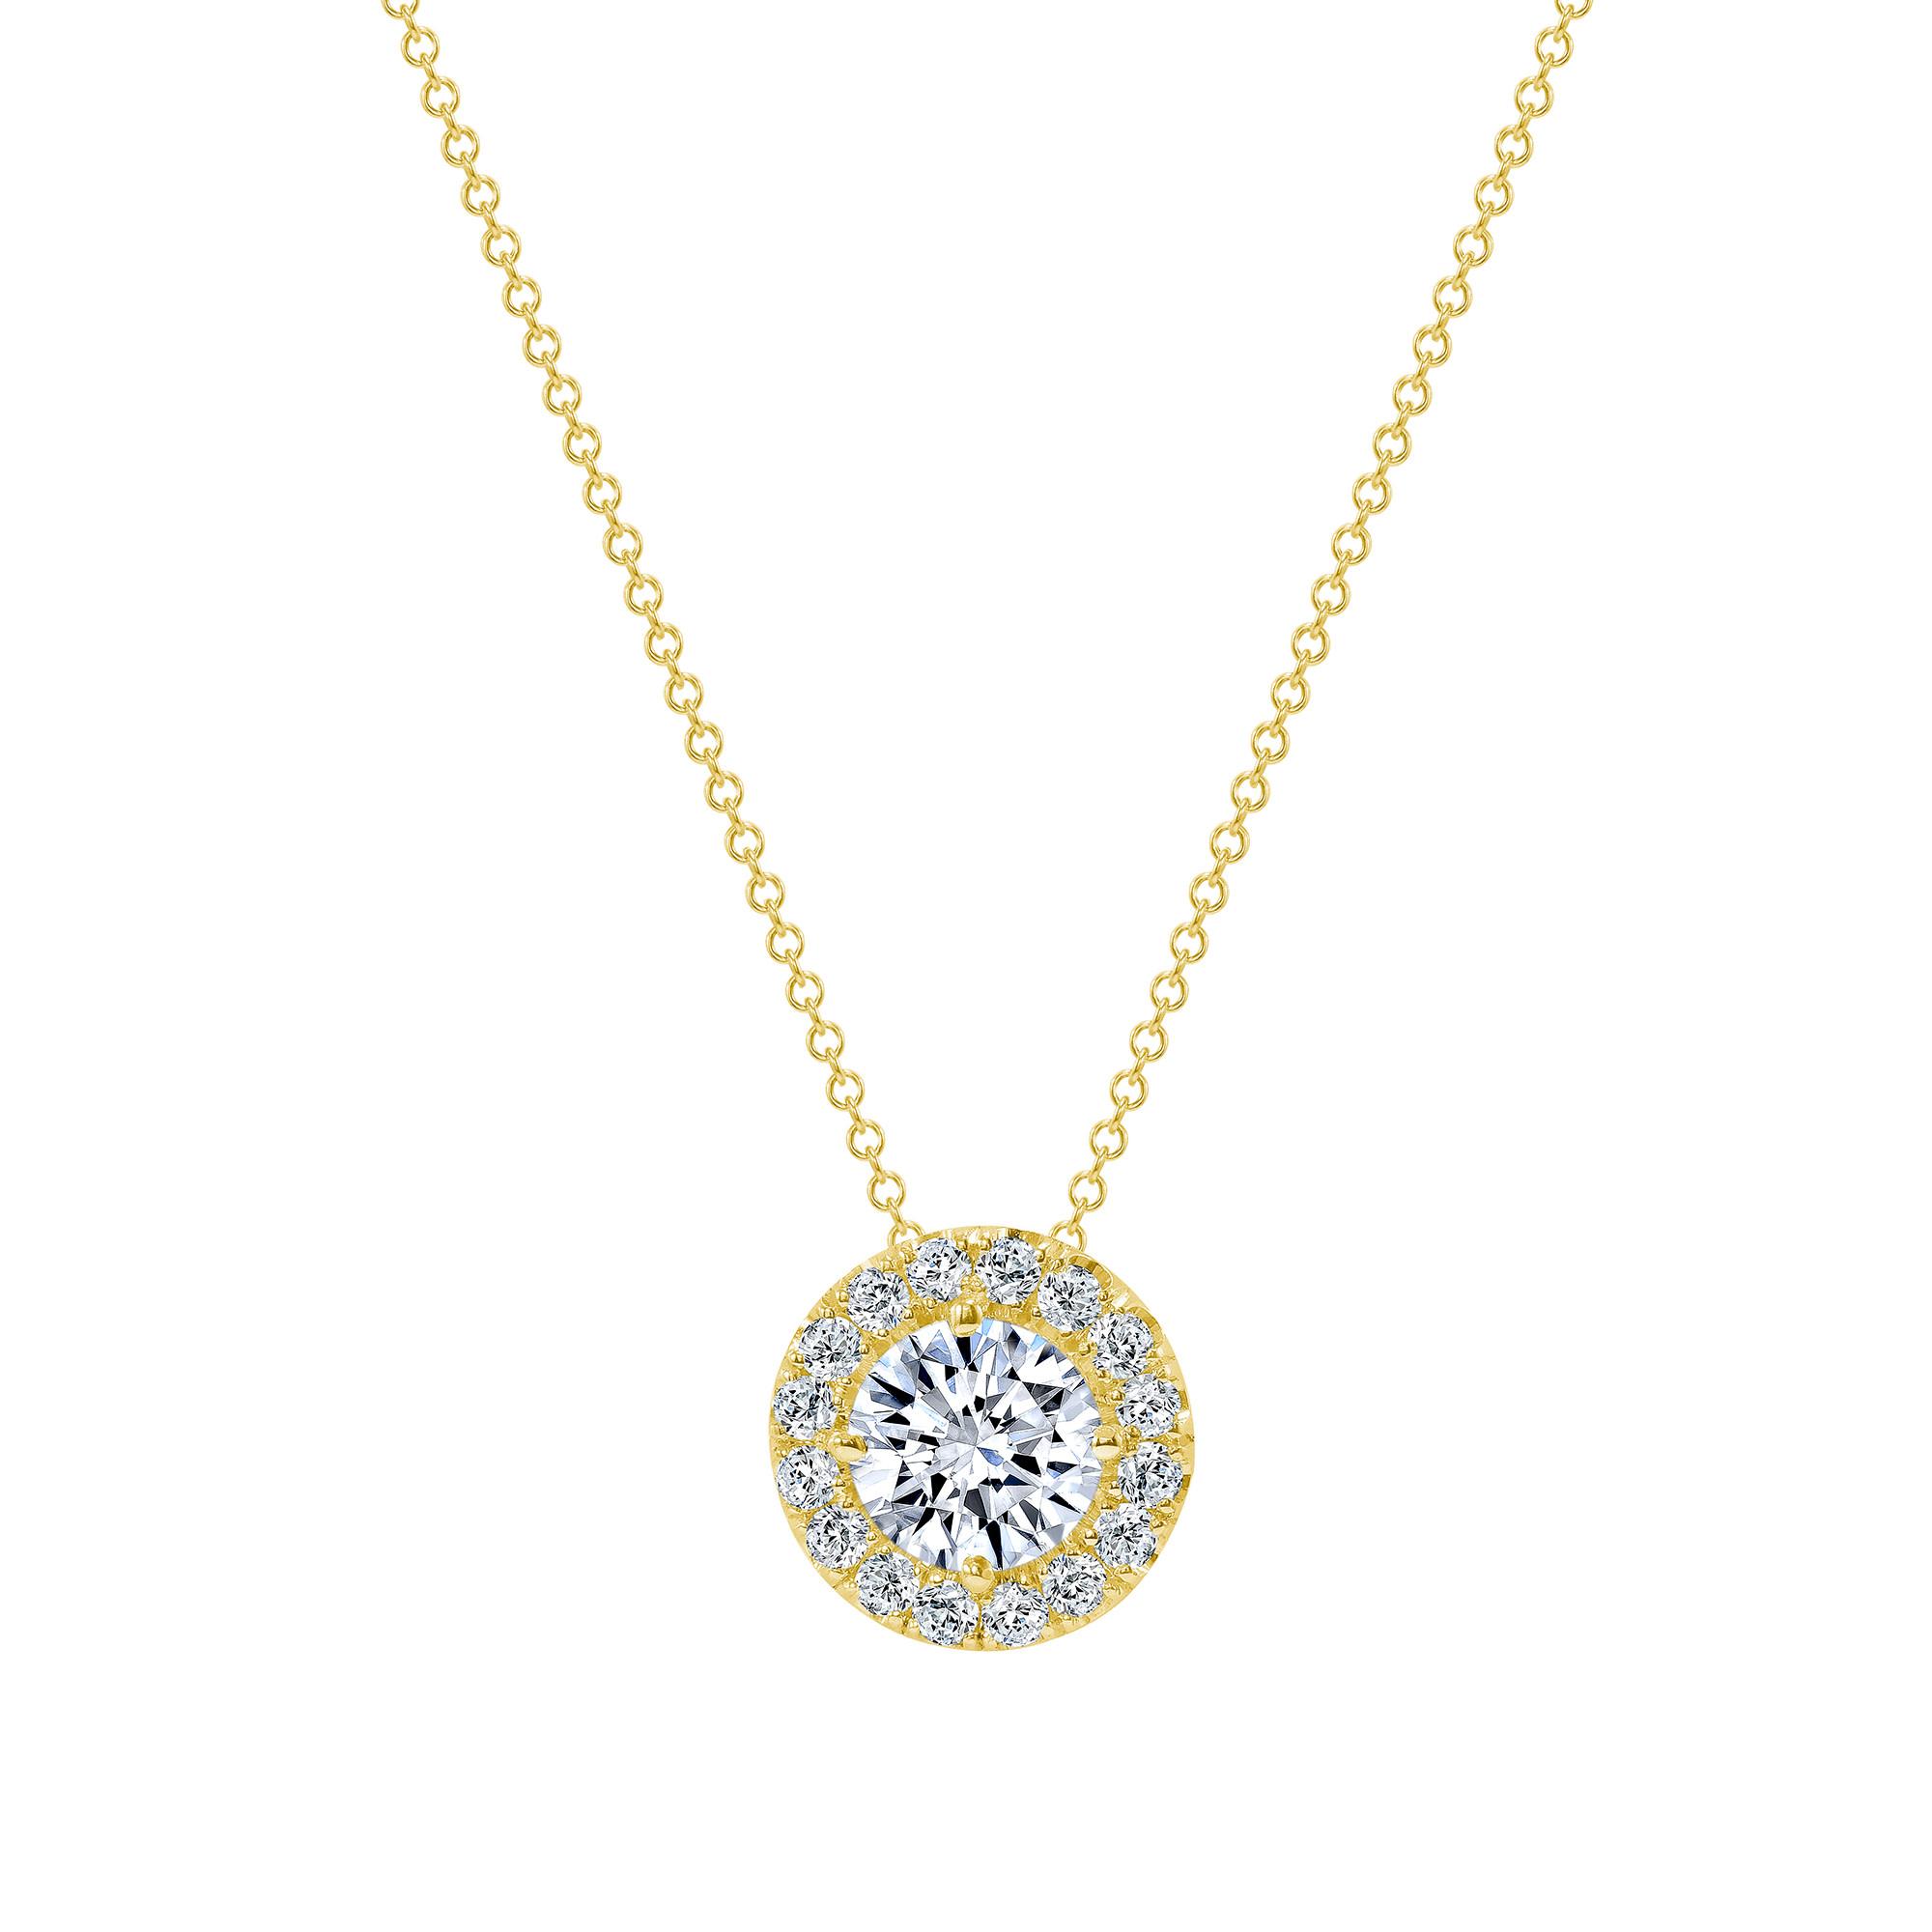 14k gold diamond pendant necklace